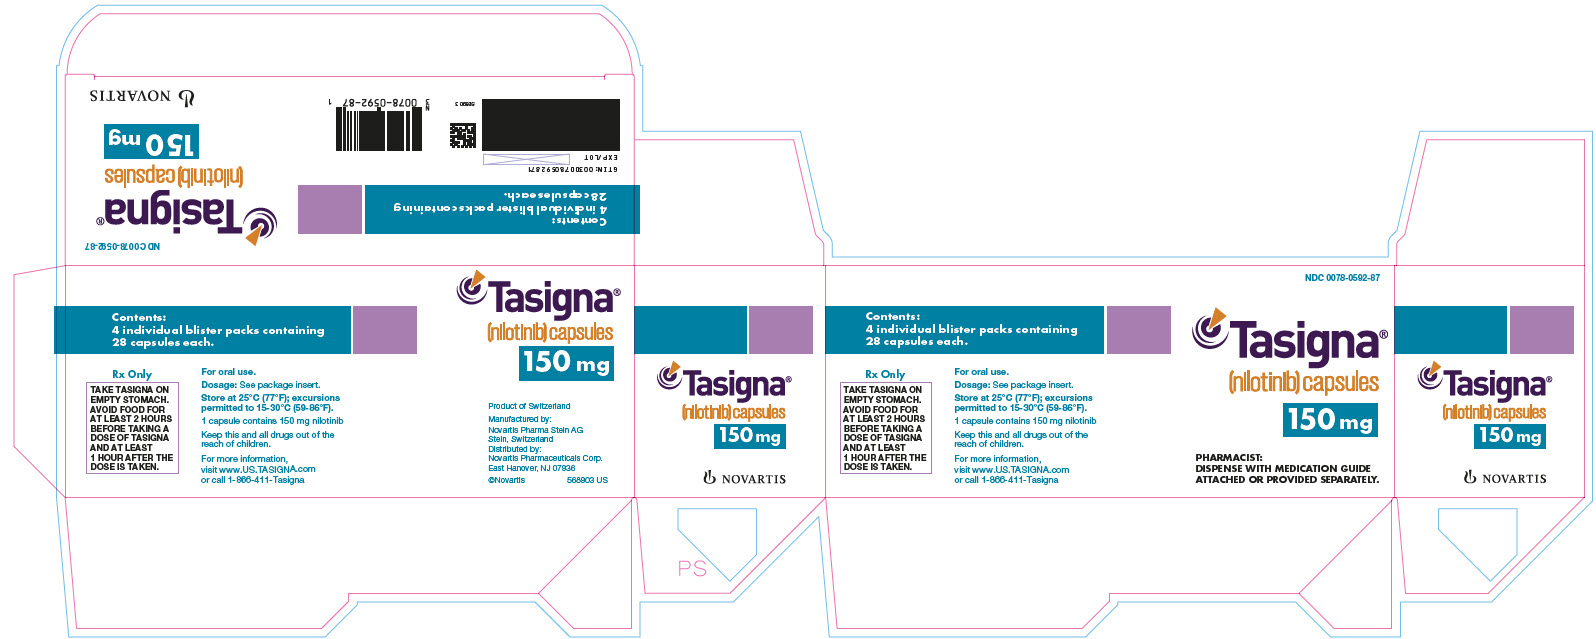 NDC: <a href=/NDC/0078-0592-87>0078-0592-87</a> Tasigna (nilotinib) capsules 150 mg